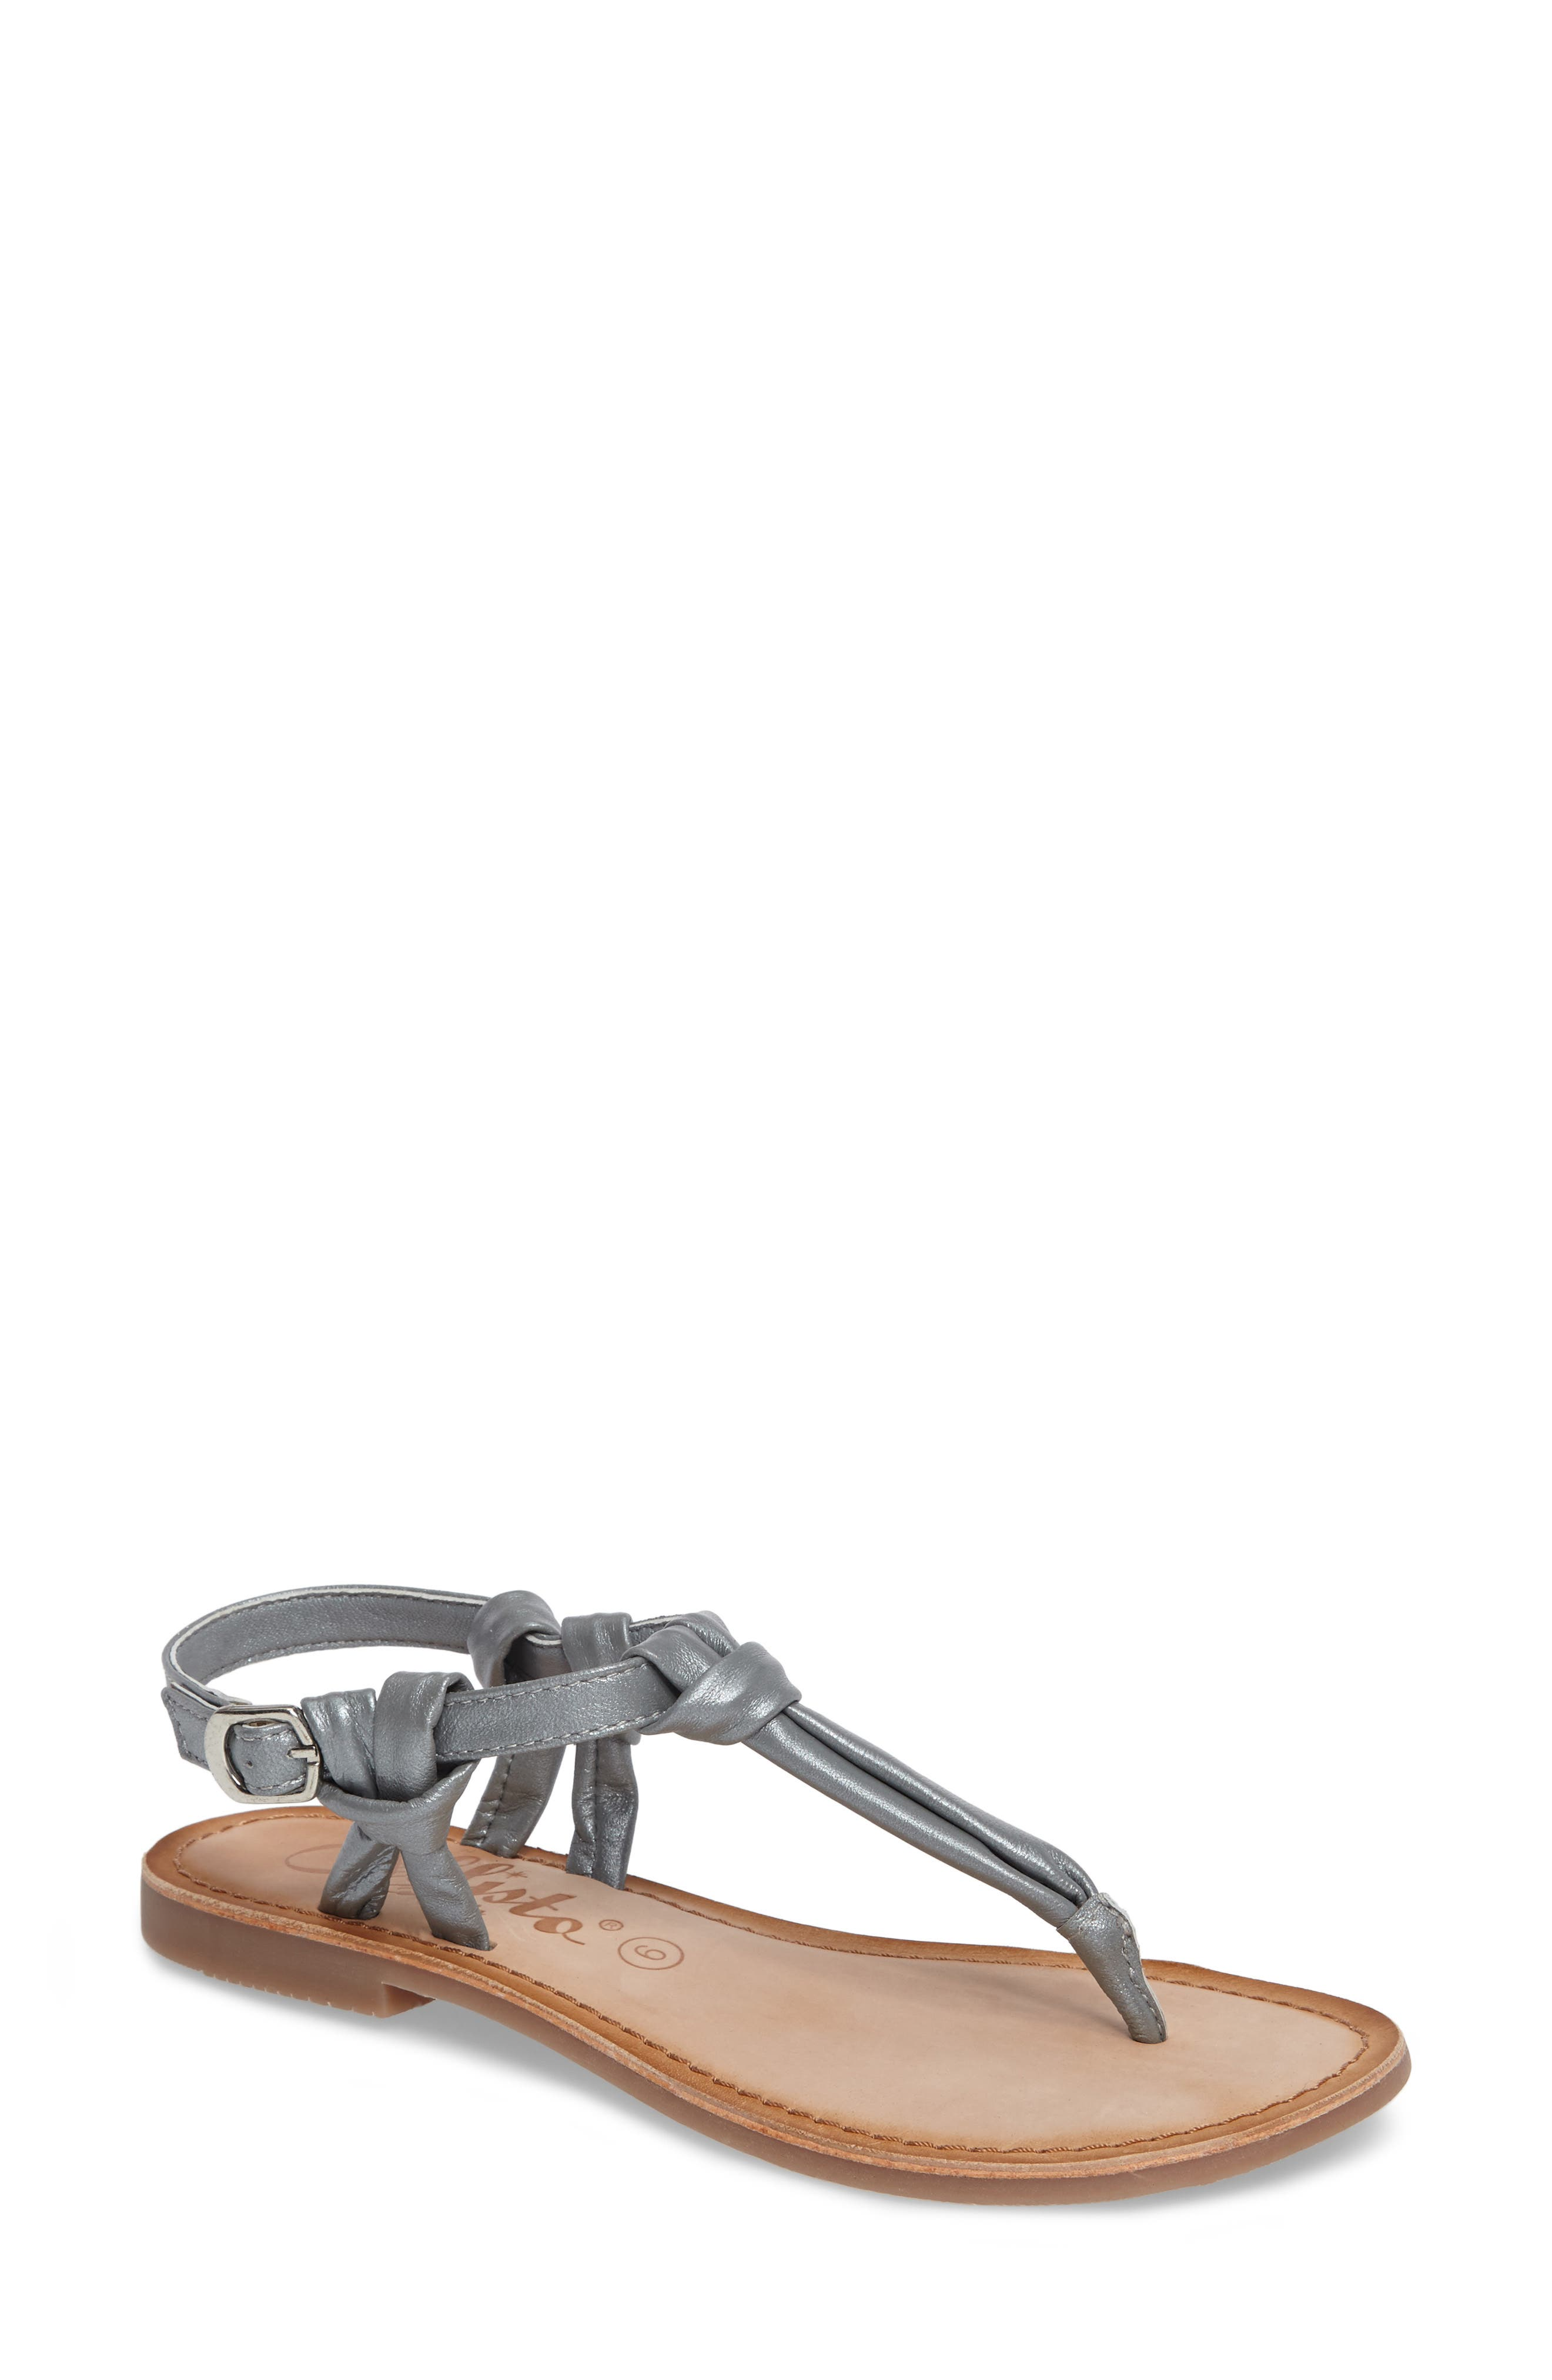 Azza T-Strap Sandal,                             Main thumbnail 1, color,                             PEWTER LEATHER